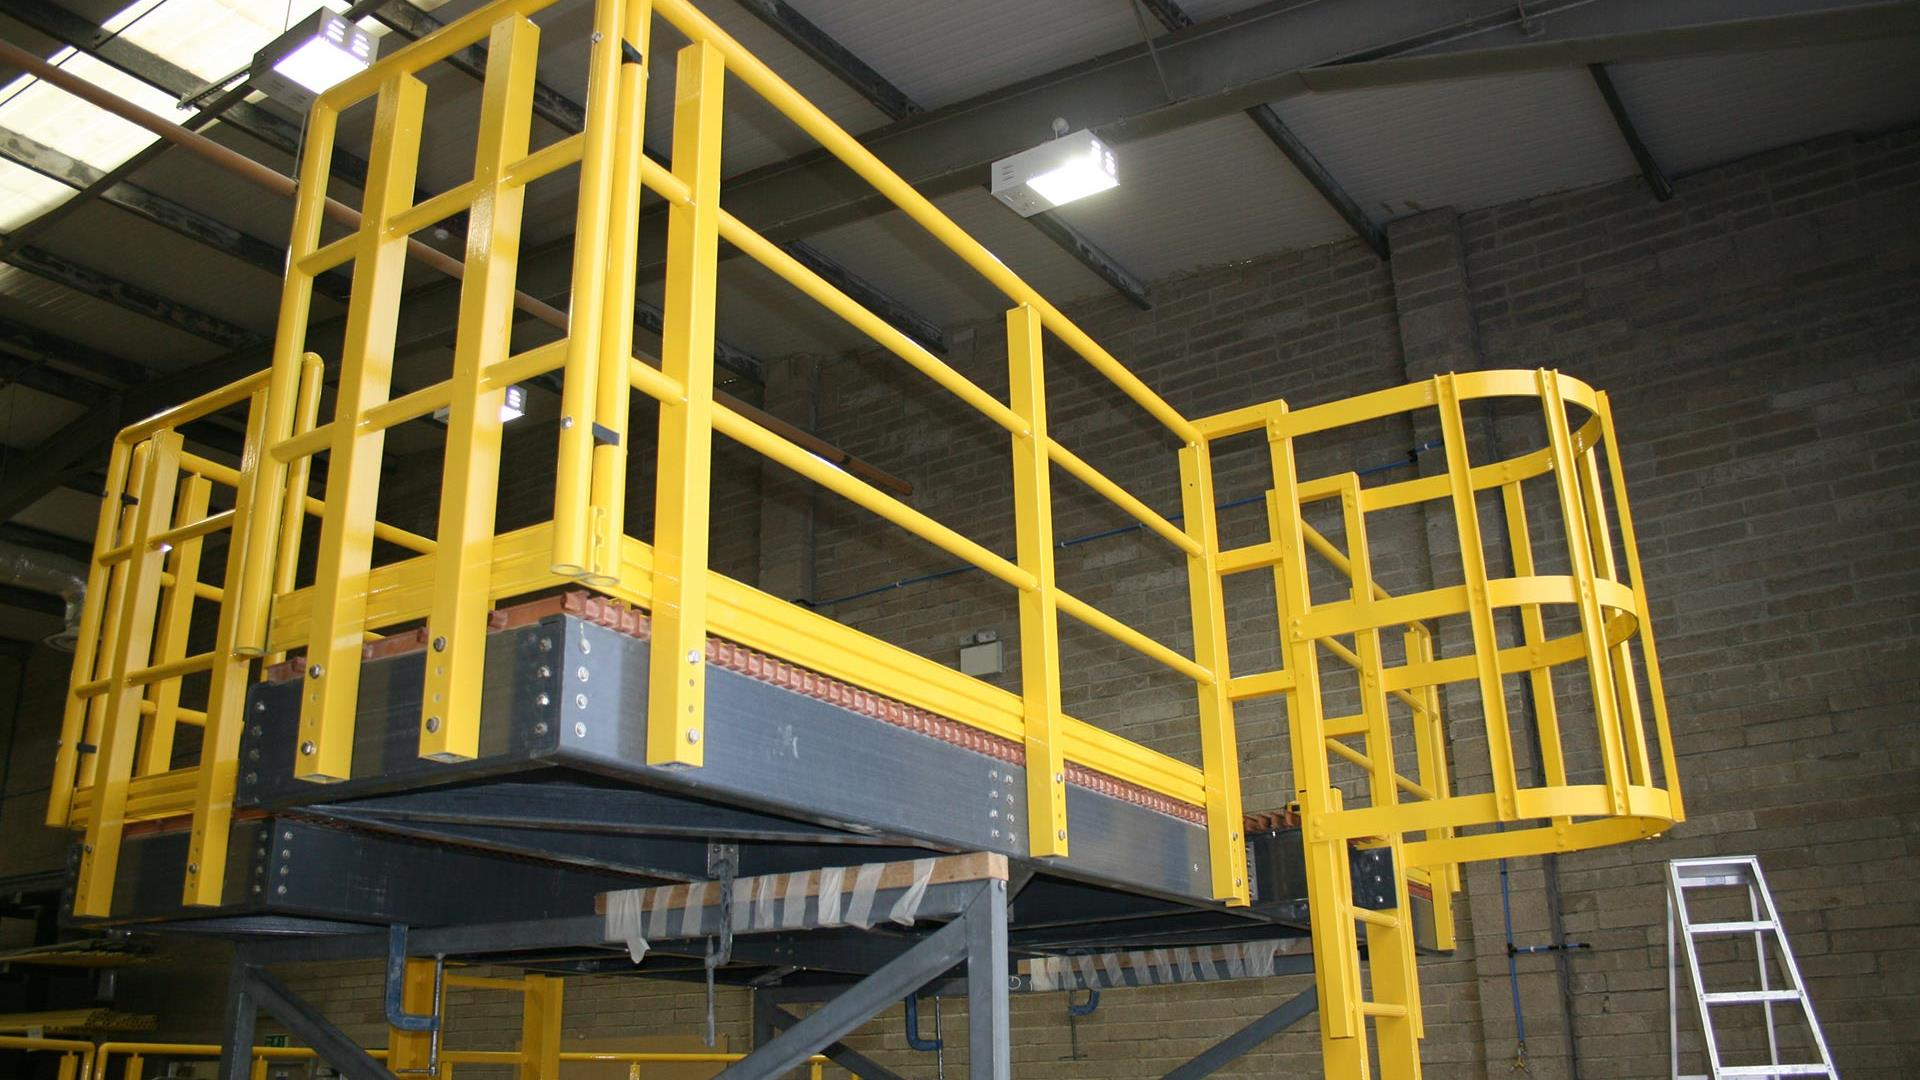 A platform with yellow fiberglass ladder and railings